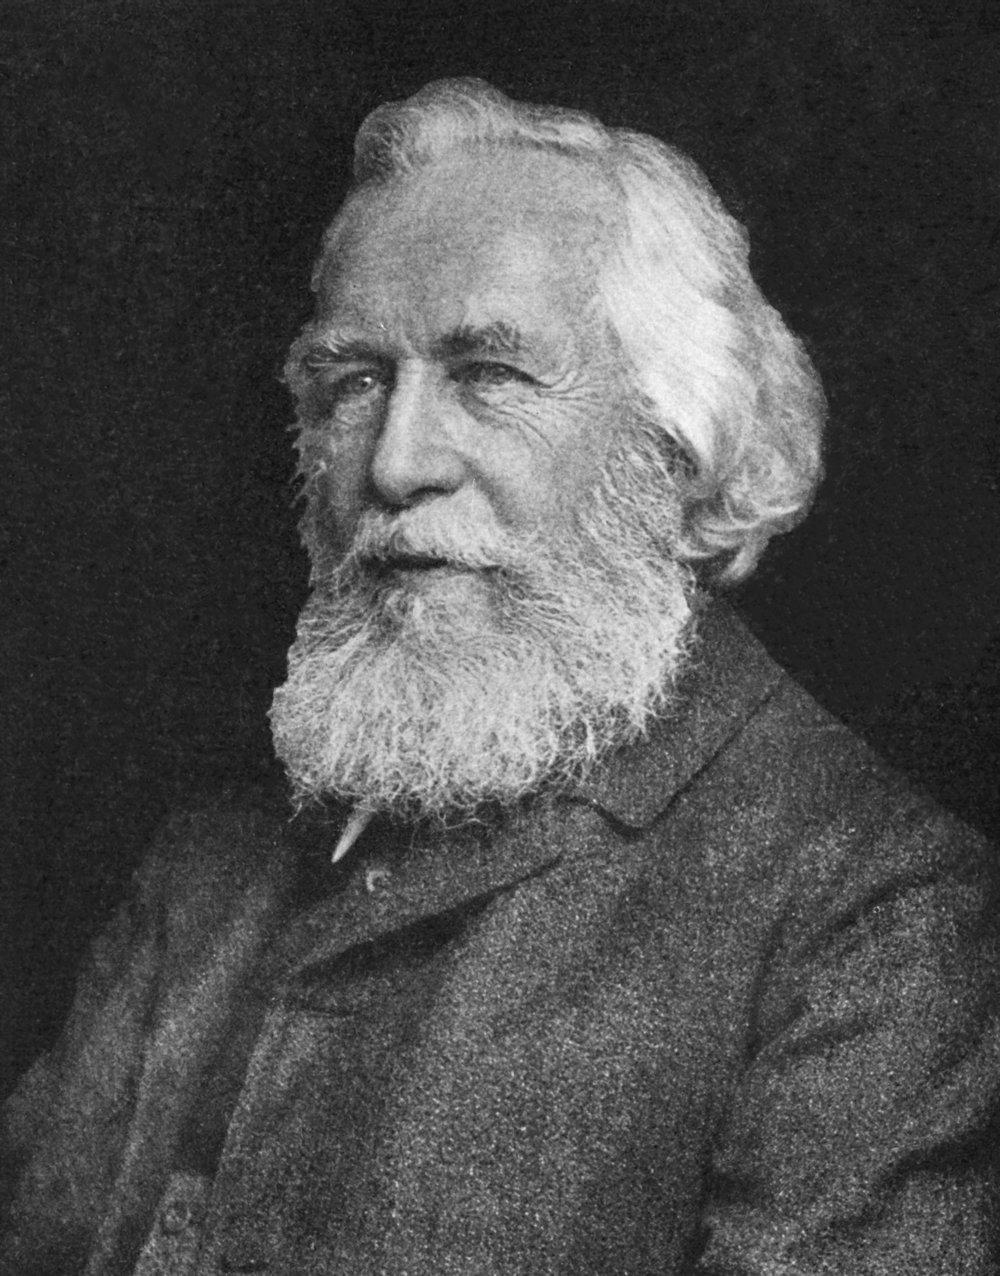 Ernst_Haeckel_5.jpg